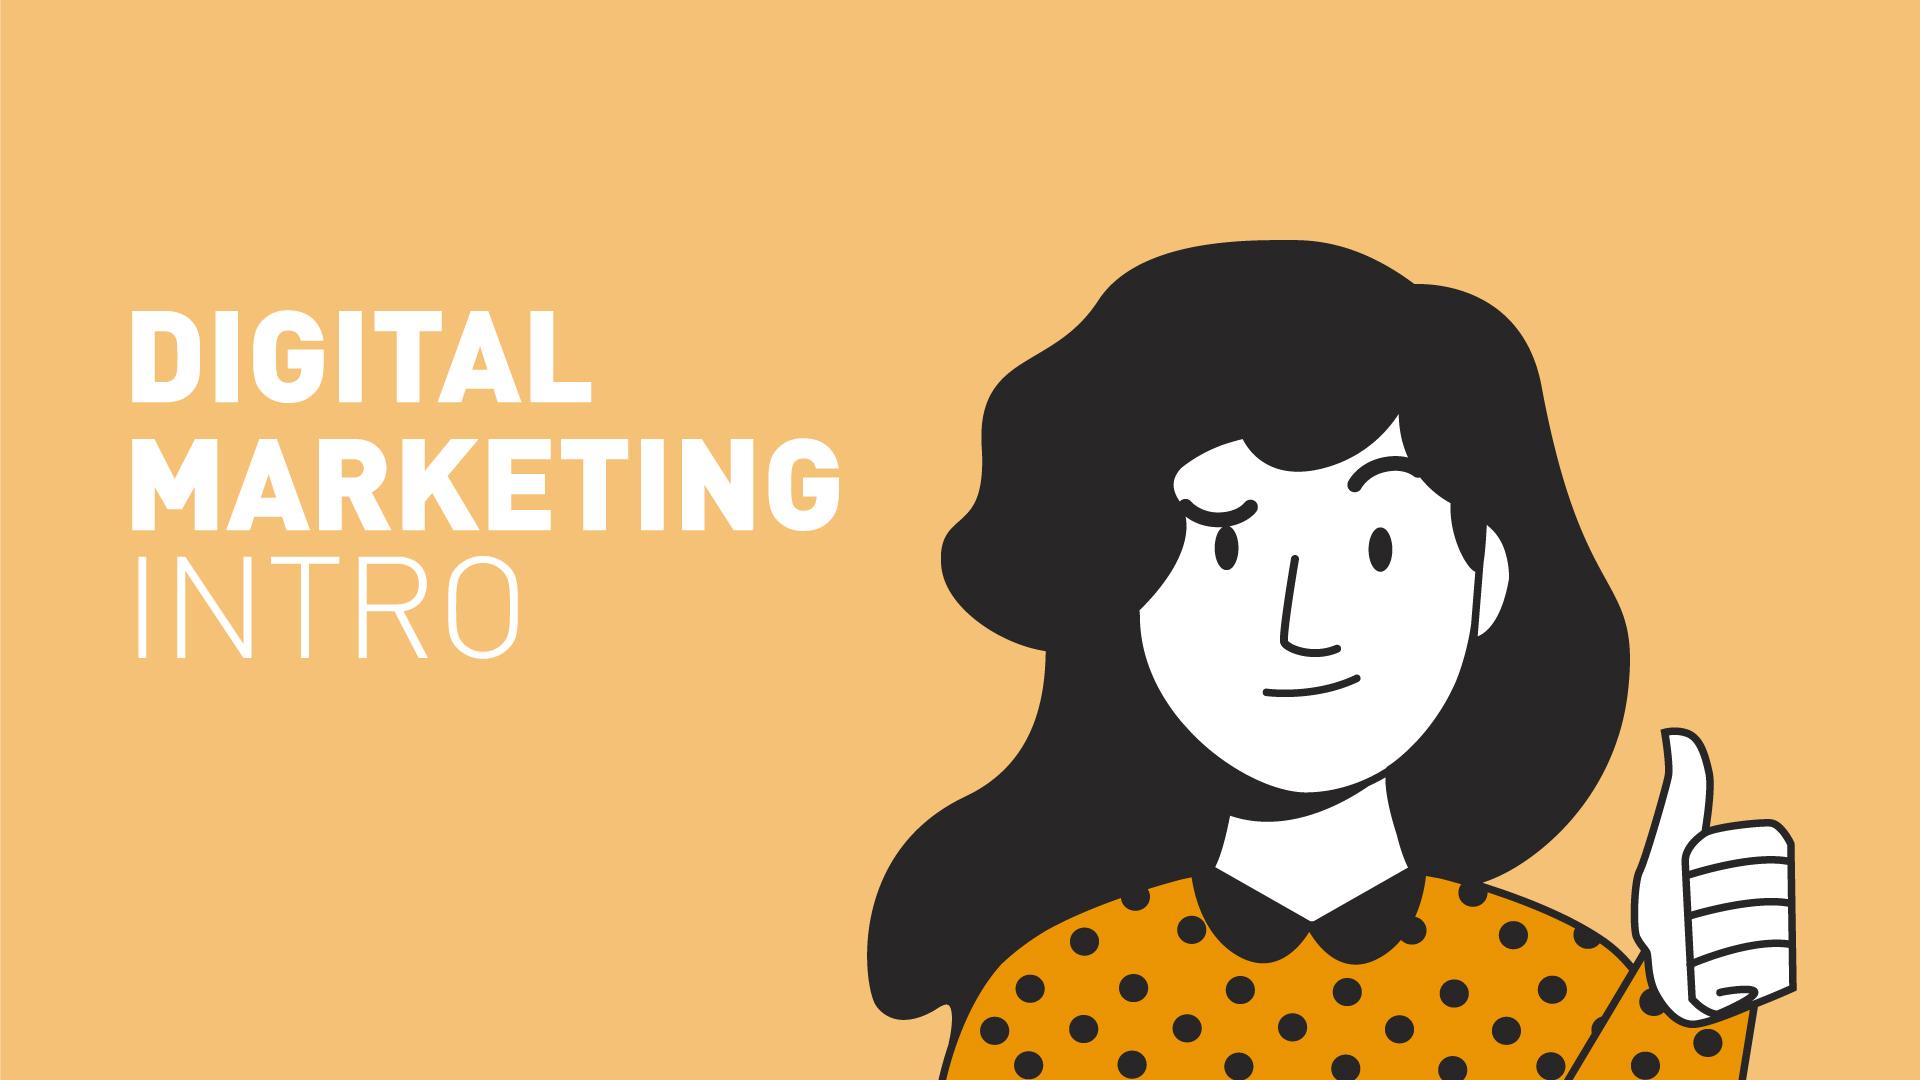 Digital Marketing – Introimage